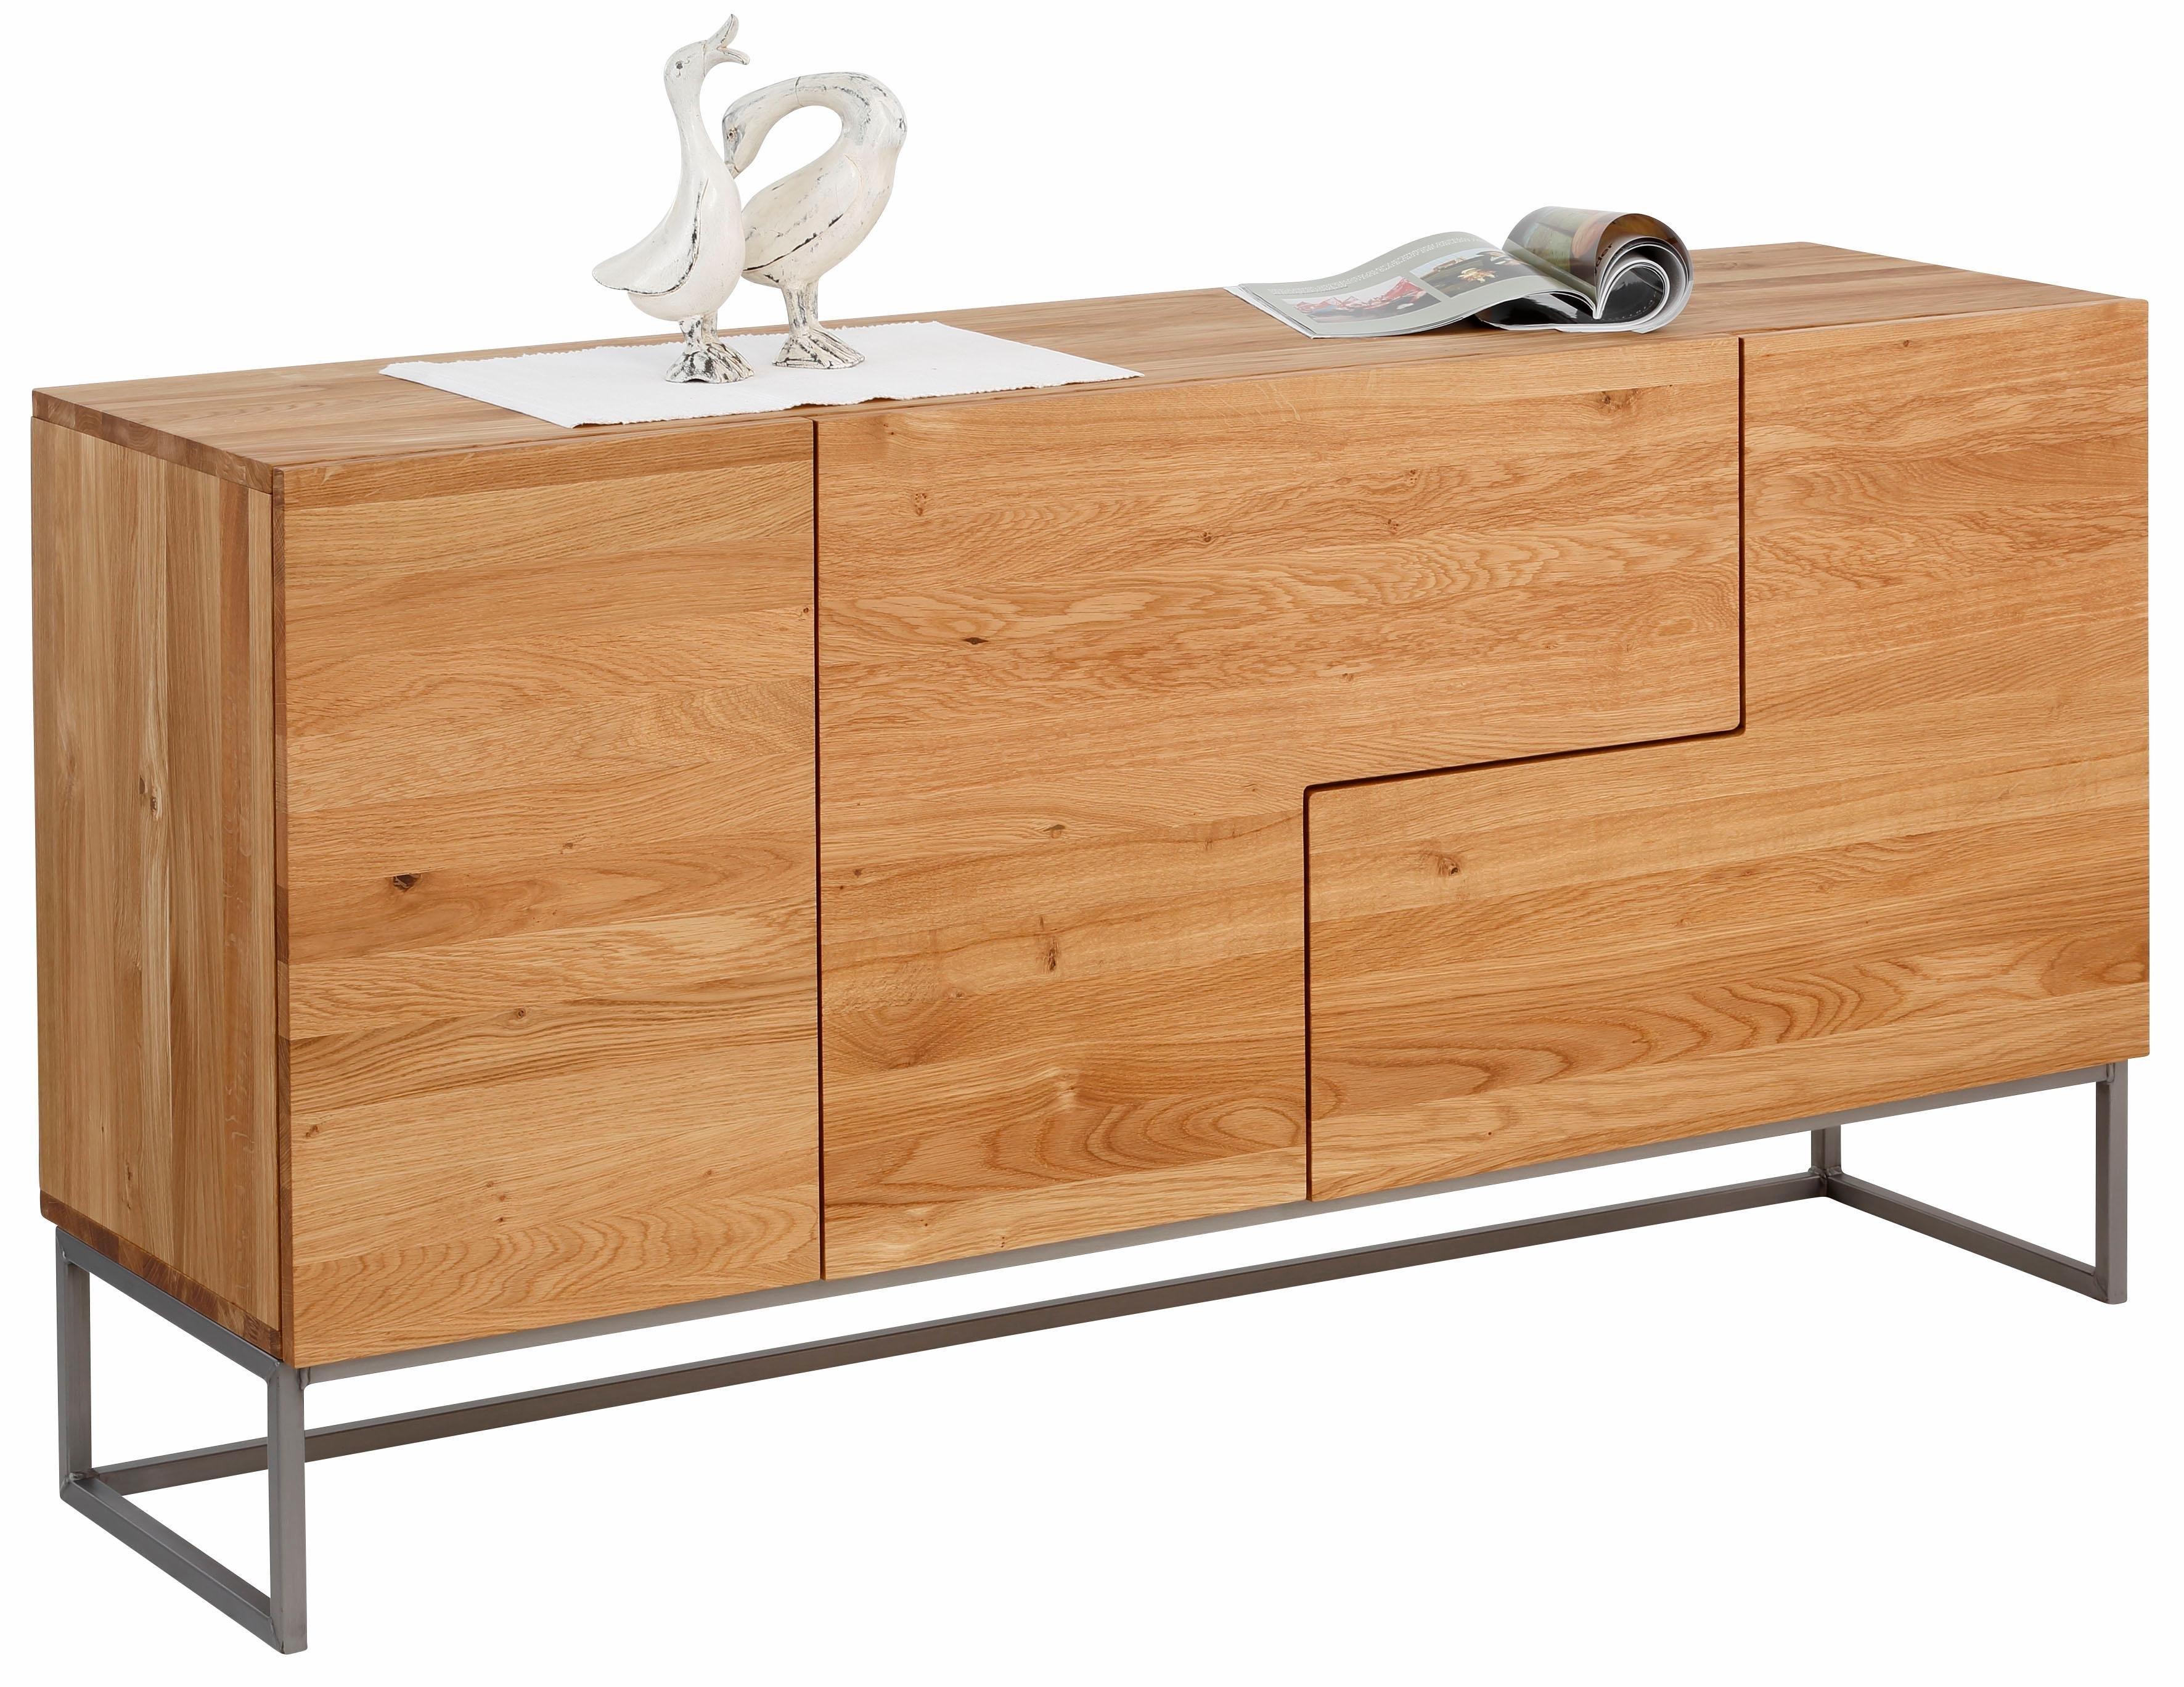 Premium collection by Home affaire Home affaire dressoir »Svear«, breedte 160 cm, van massief eiken - gratis ruilen op otto.nl